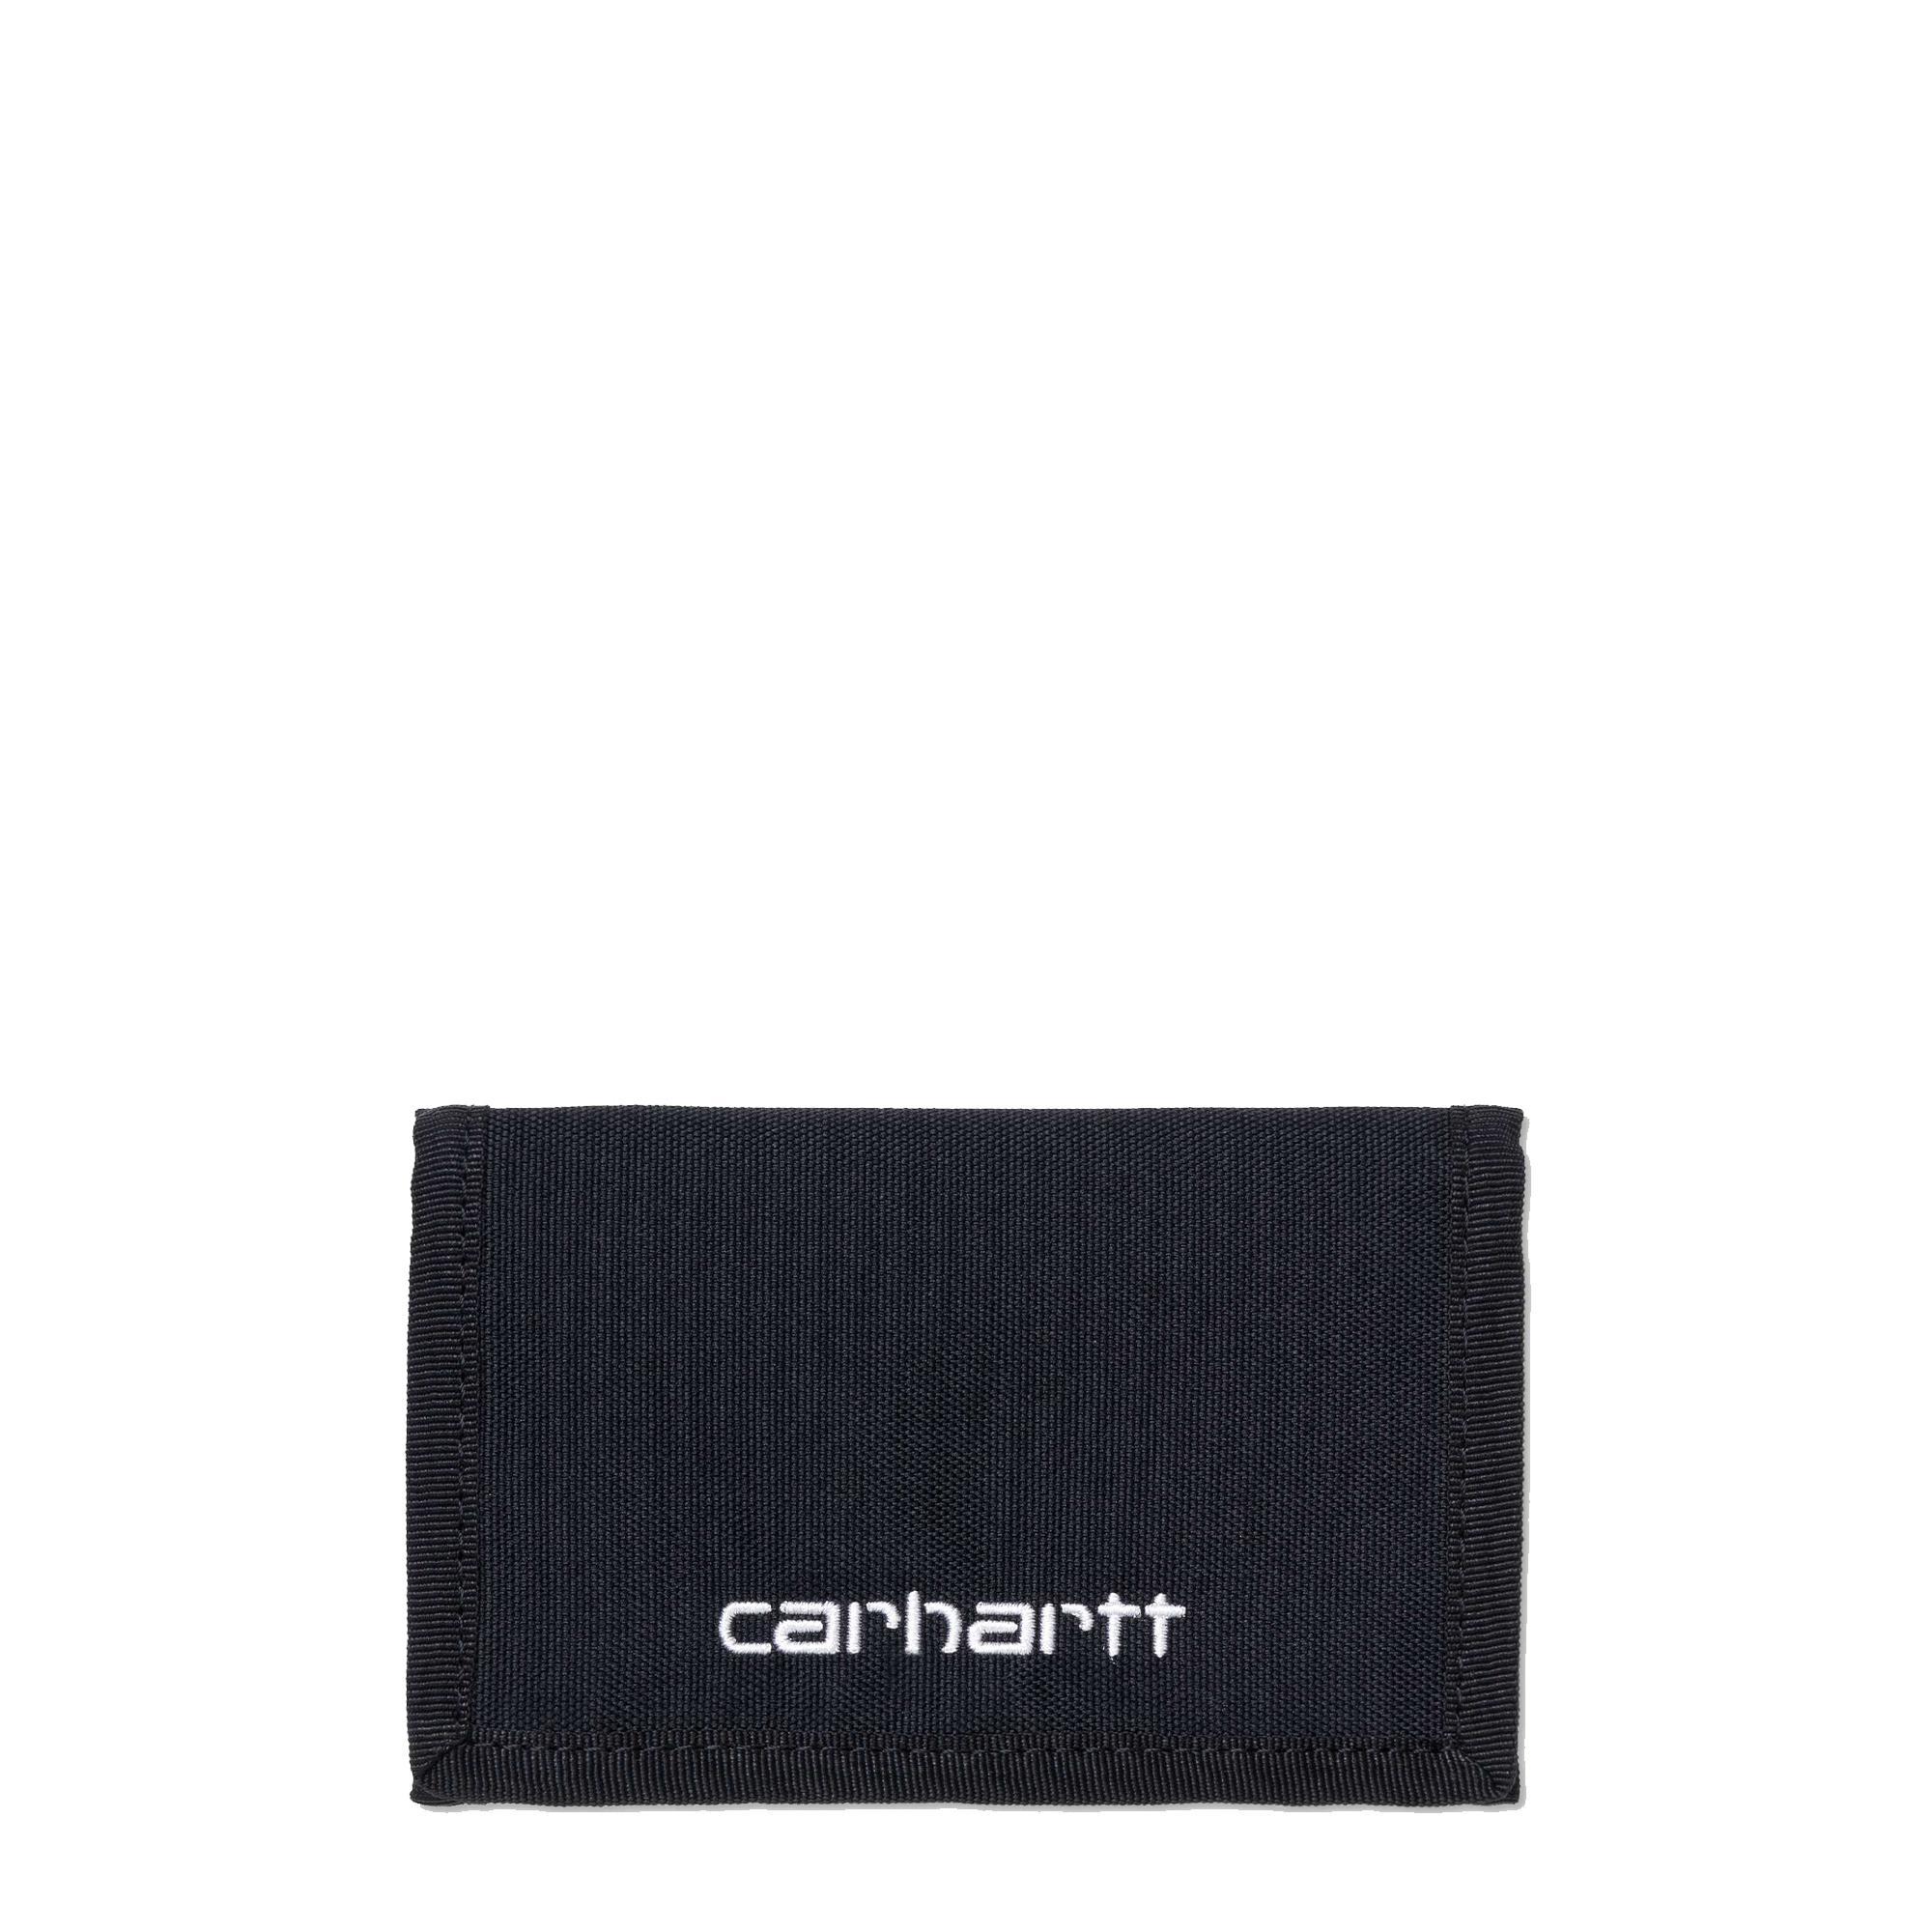 Carhartt Payton Wallet Black white